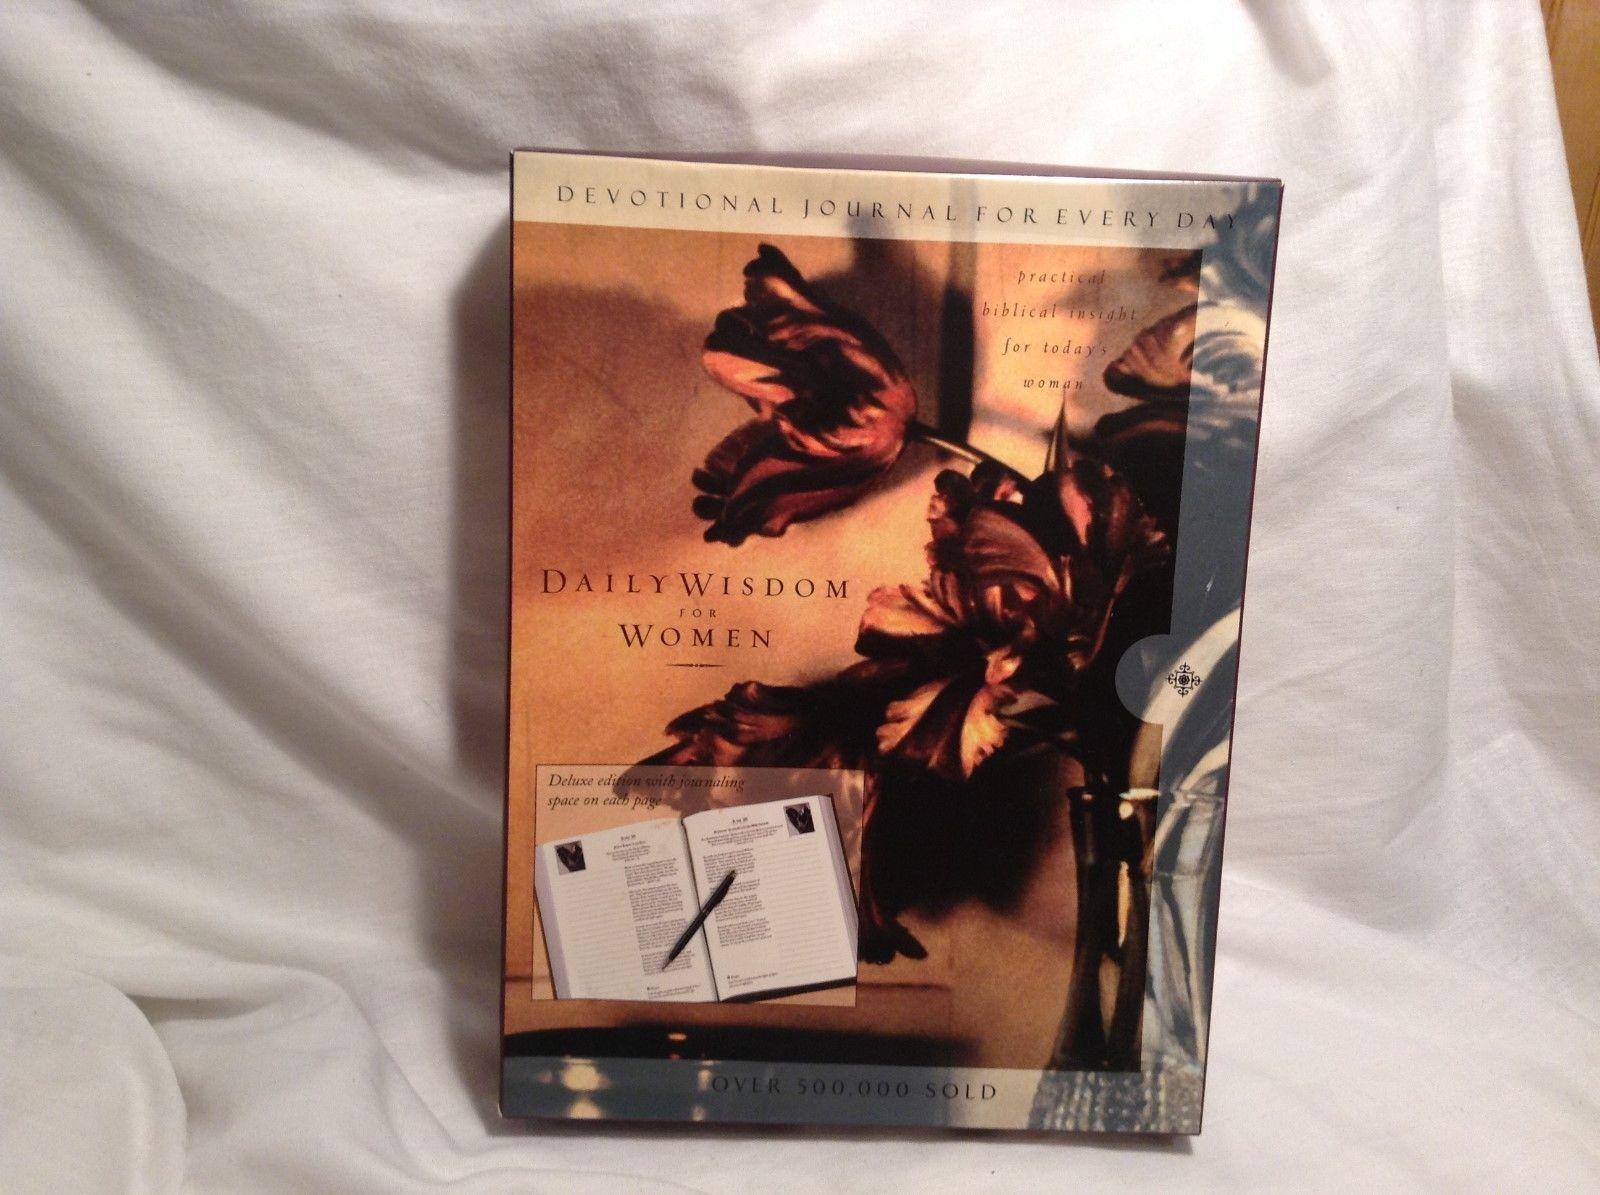 NEW Devotional Journal Daily Wisdom for Women Hardcover Journal